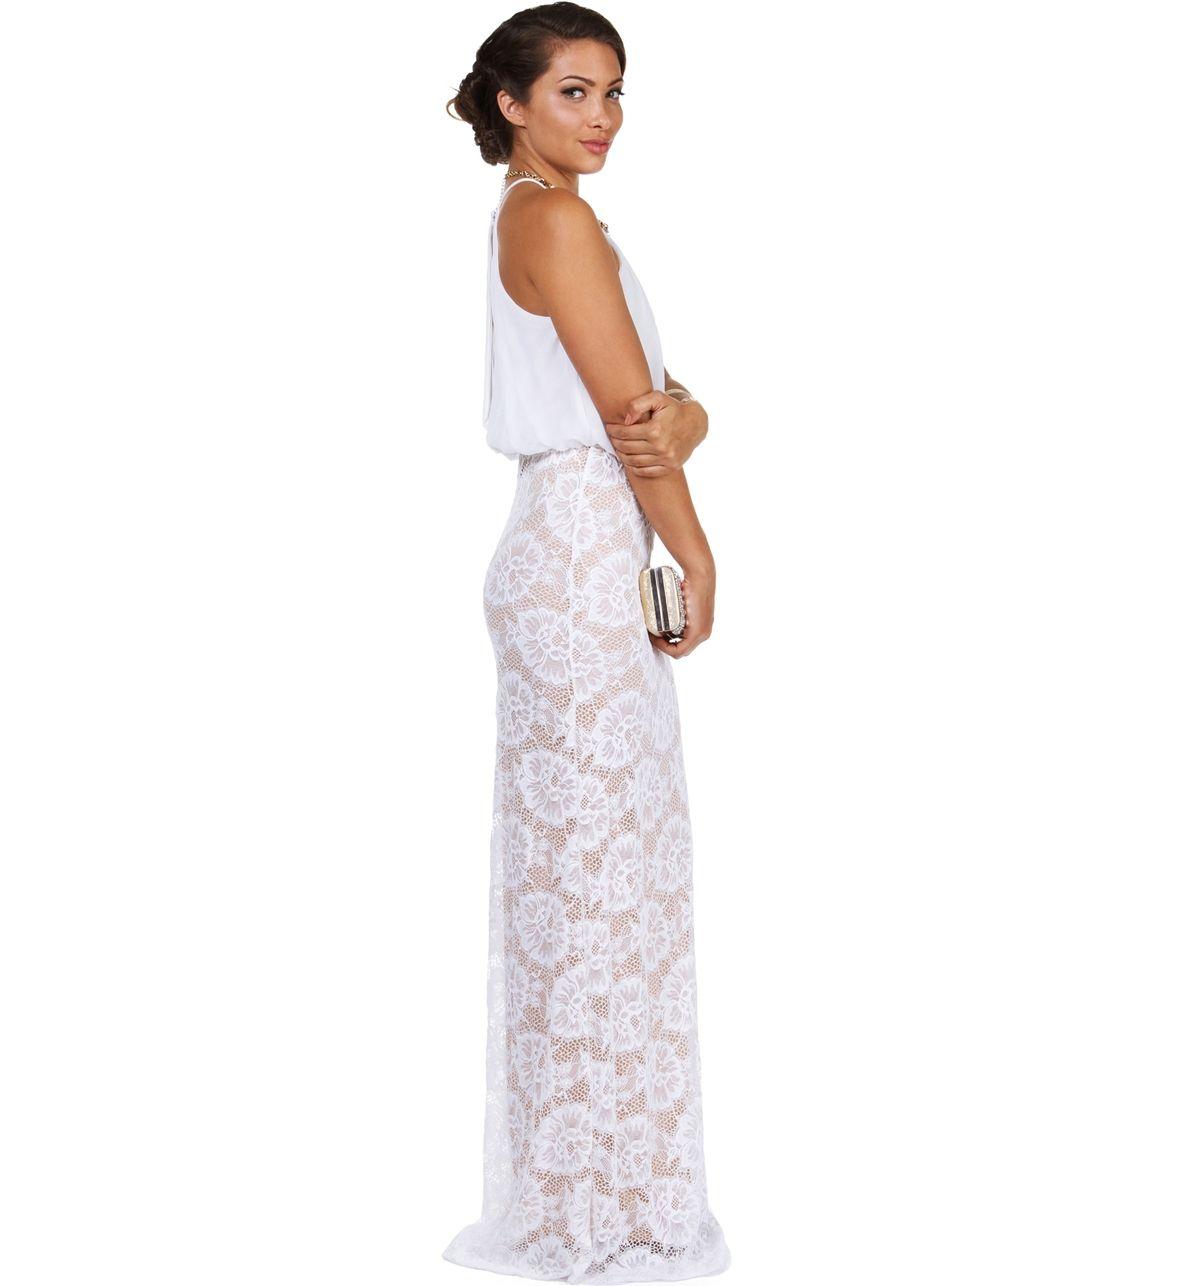 Guava wedding dresses  LeahWhite Formal Dress  Wedding Attire Ideas Nina  Pinterest